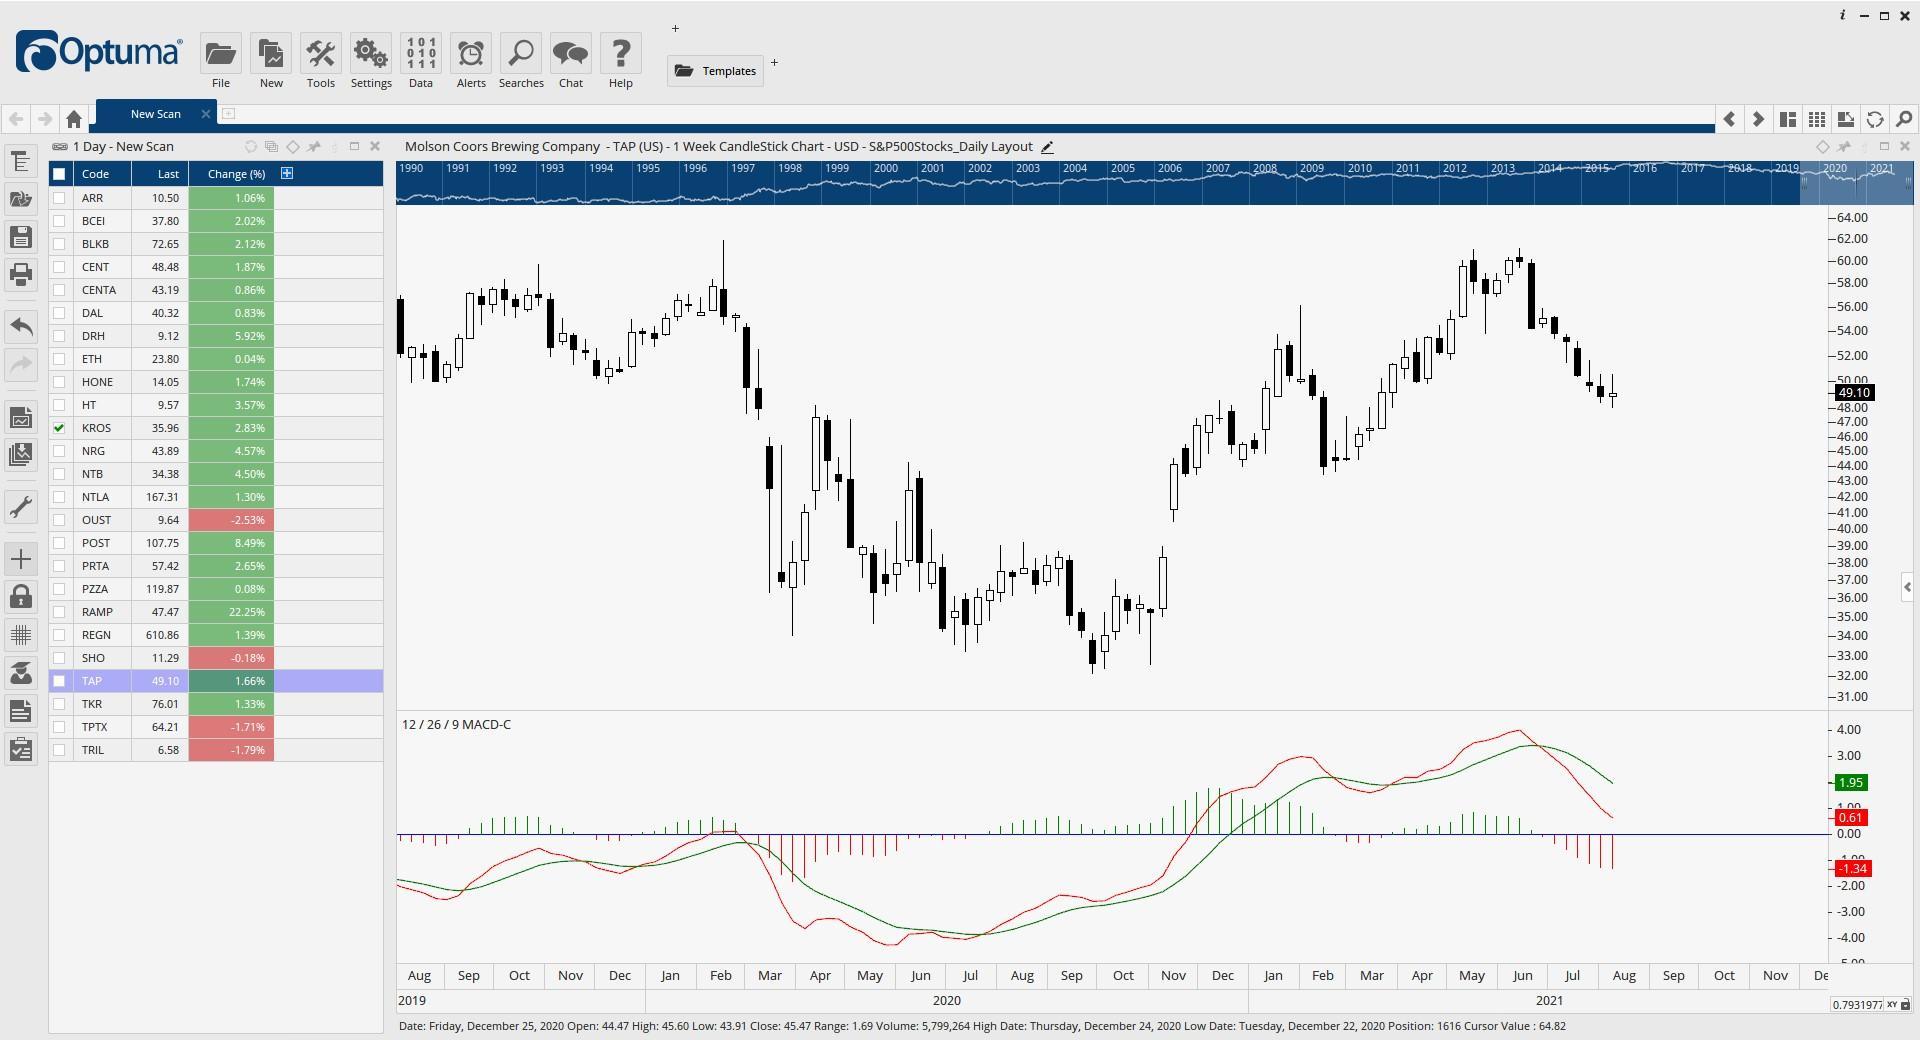 Screenshot 2021-08-07 014154